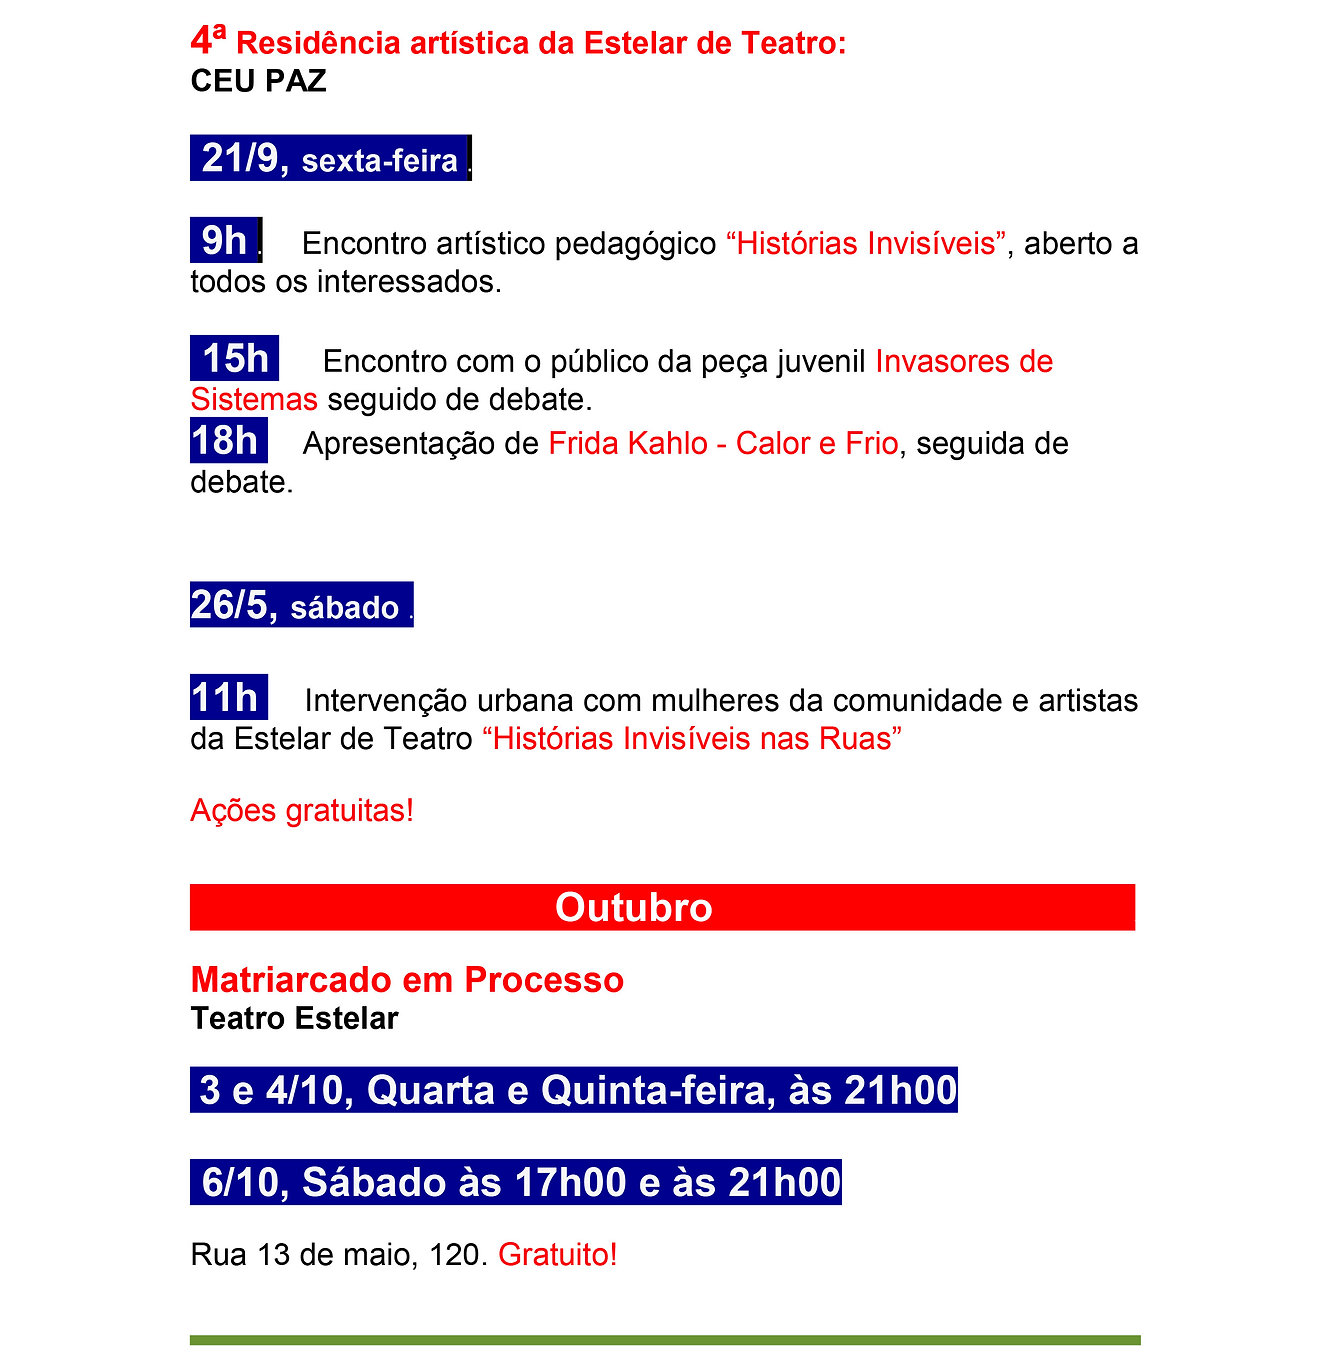 Fomento Agenda 44444444 CORRIG-7.jpg